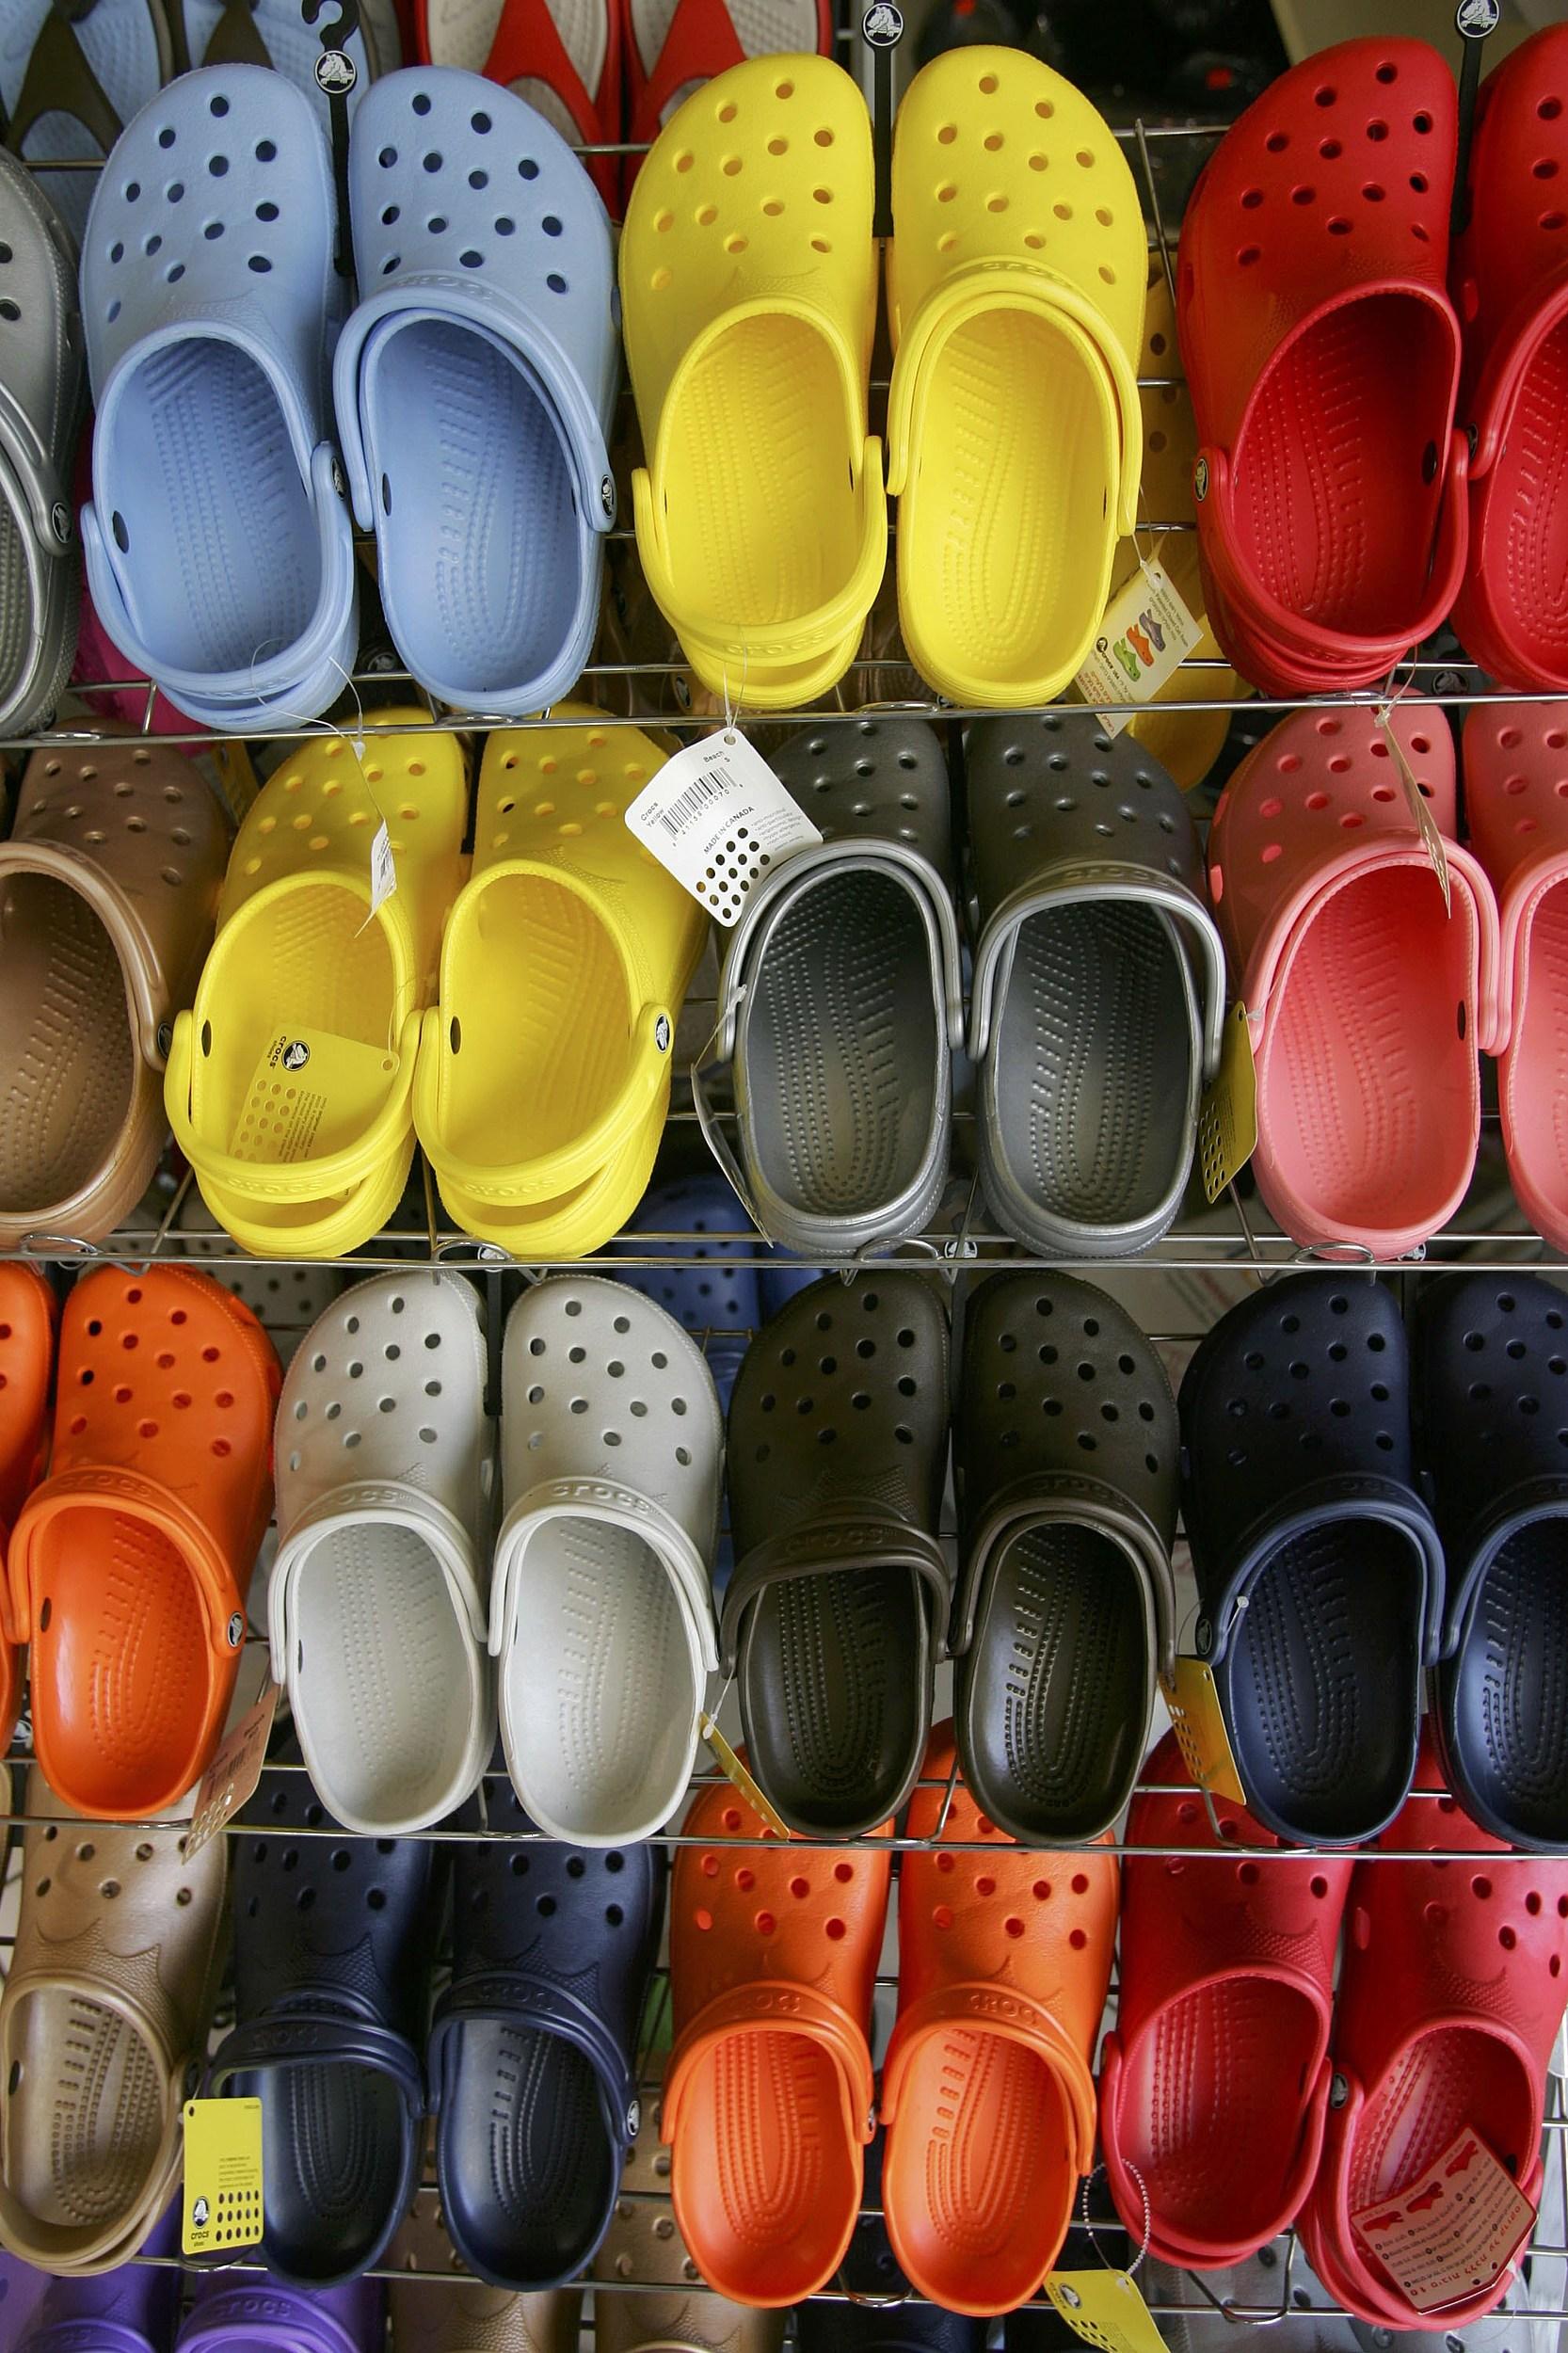 Crocs Shoes Increasingly Popular Amongst Trendy Israelis